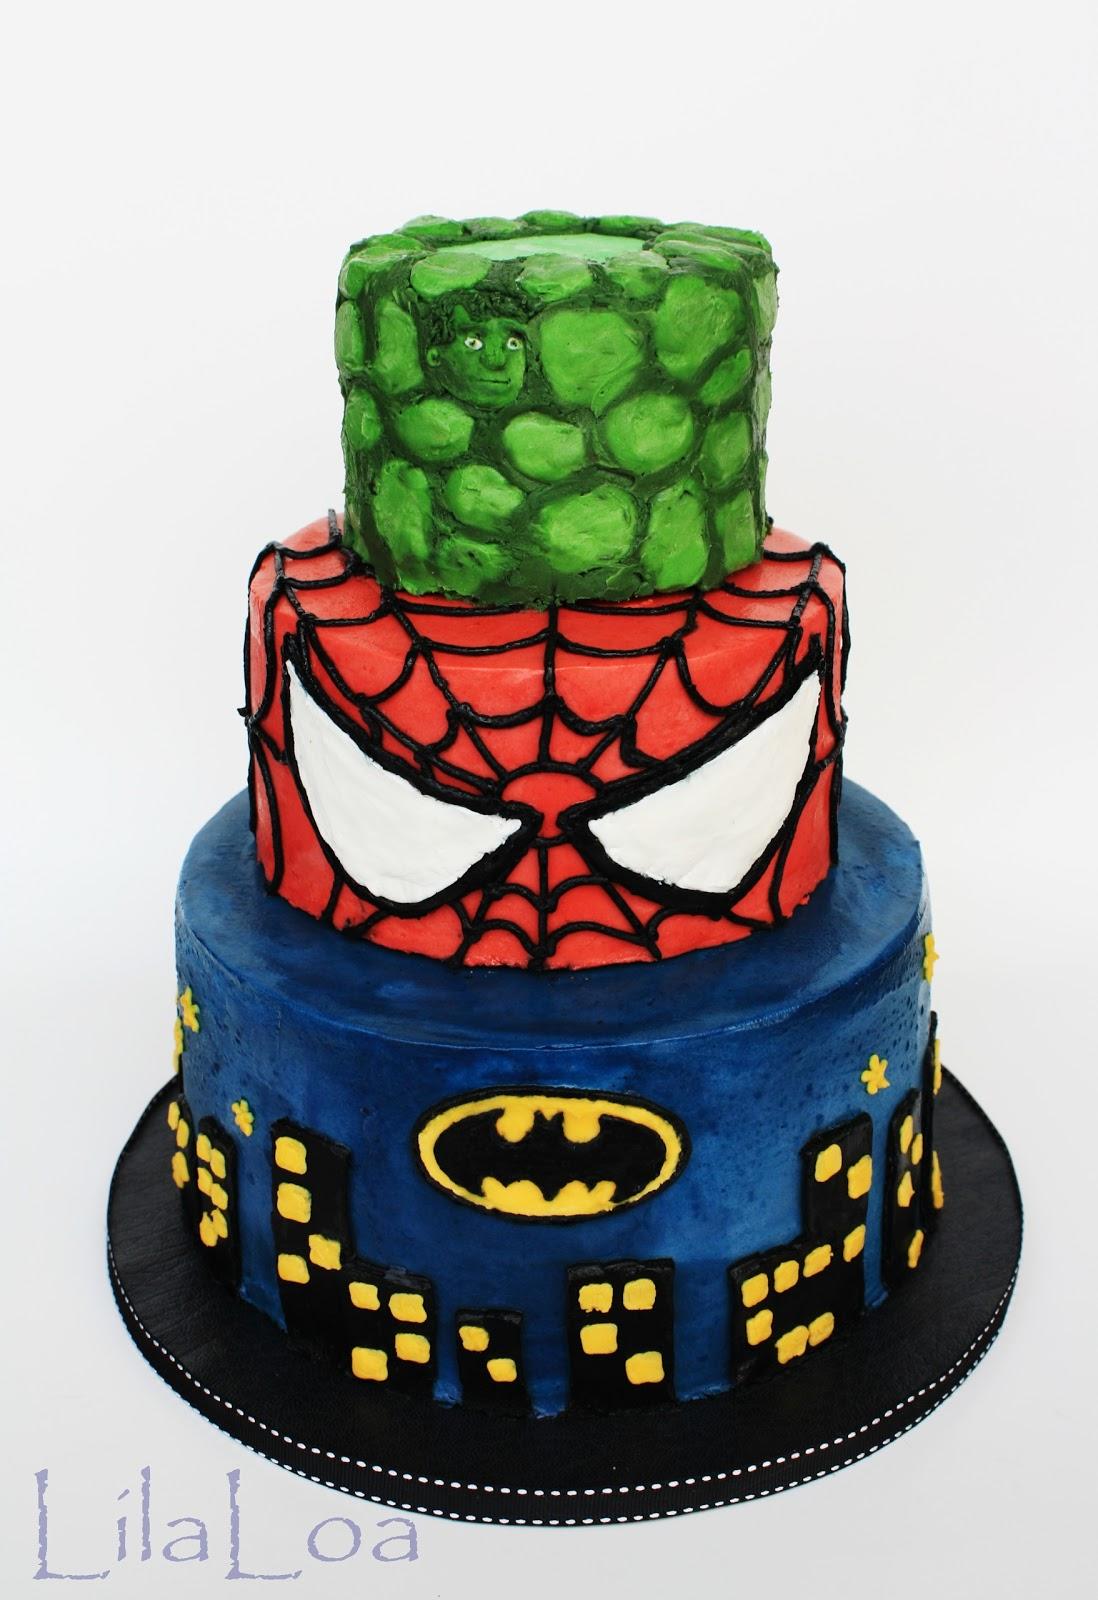 Super Hero Cake LilaLoa: Super Hero Cake